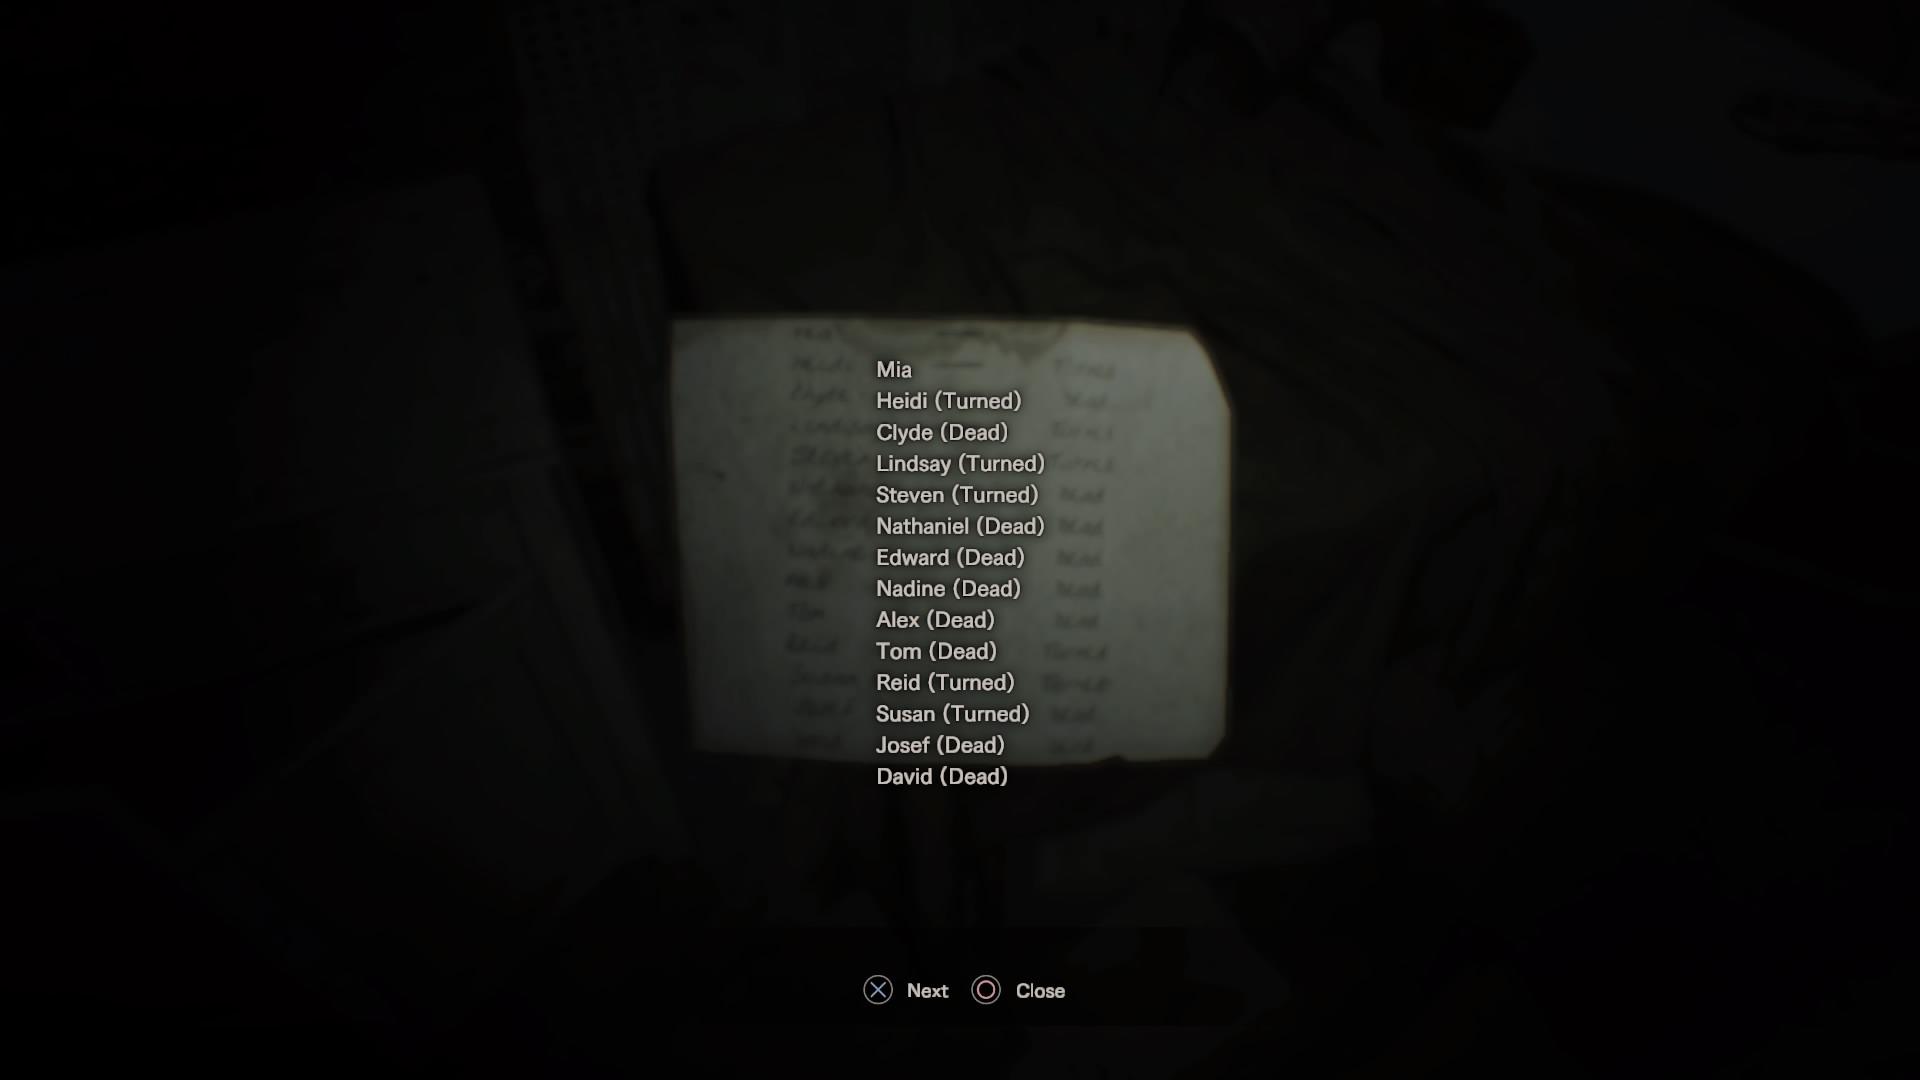 List of Names (Back)